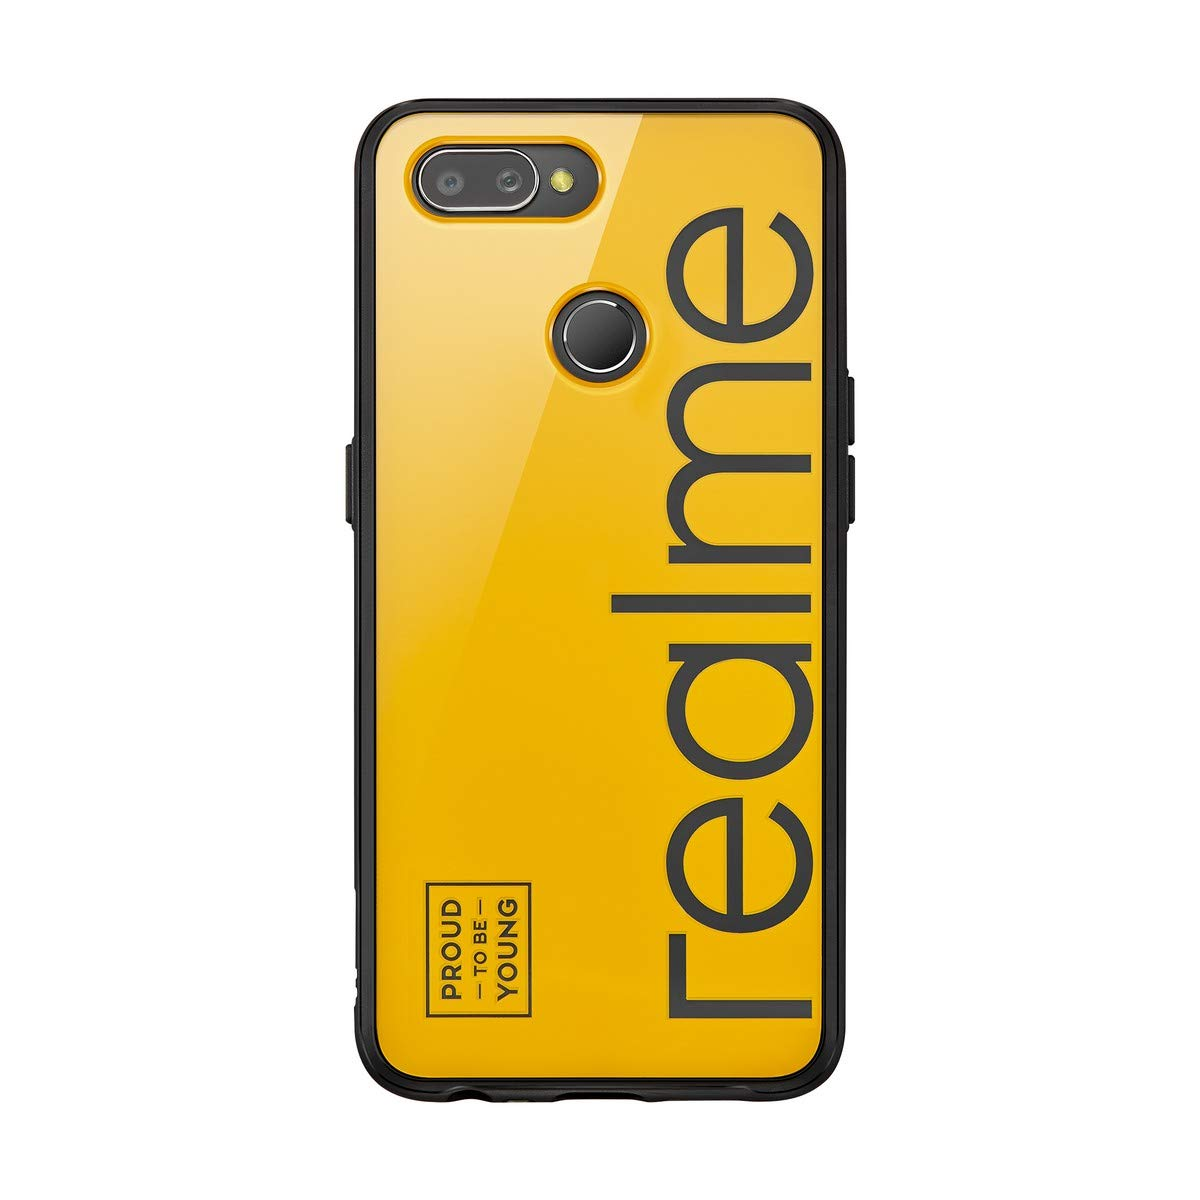 Realme Iconic RMA102 Phone Case for Realme U1 (Yellow)